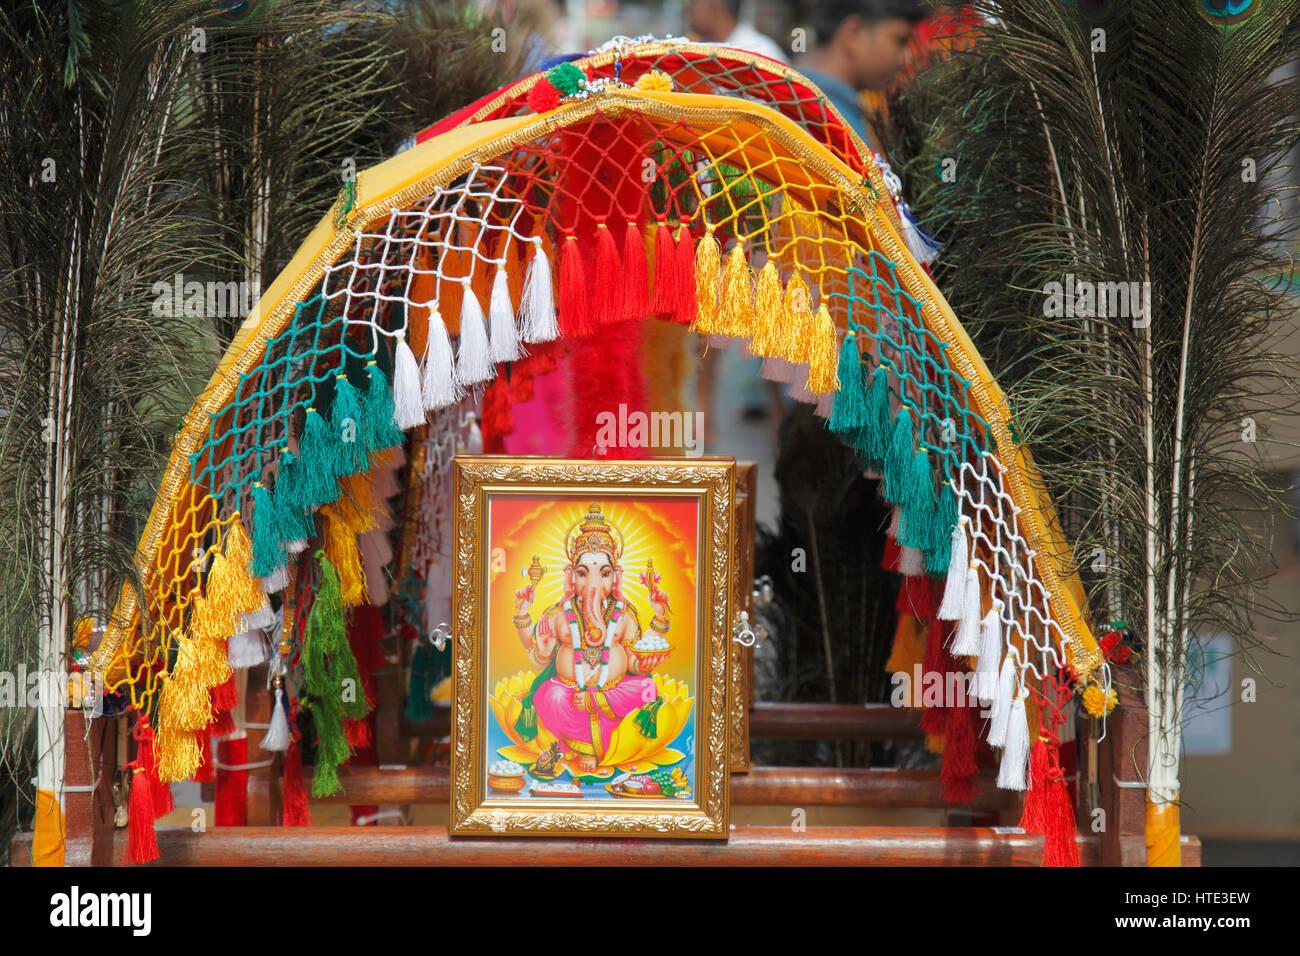 Singapore, Little India, shop, dio elefantino Ganesh immagine, Immagini Stock